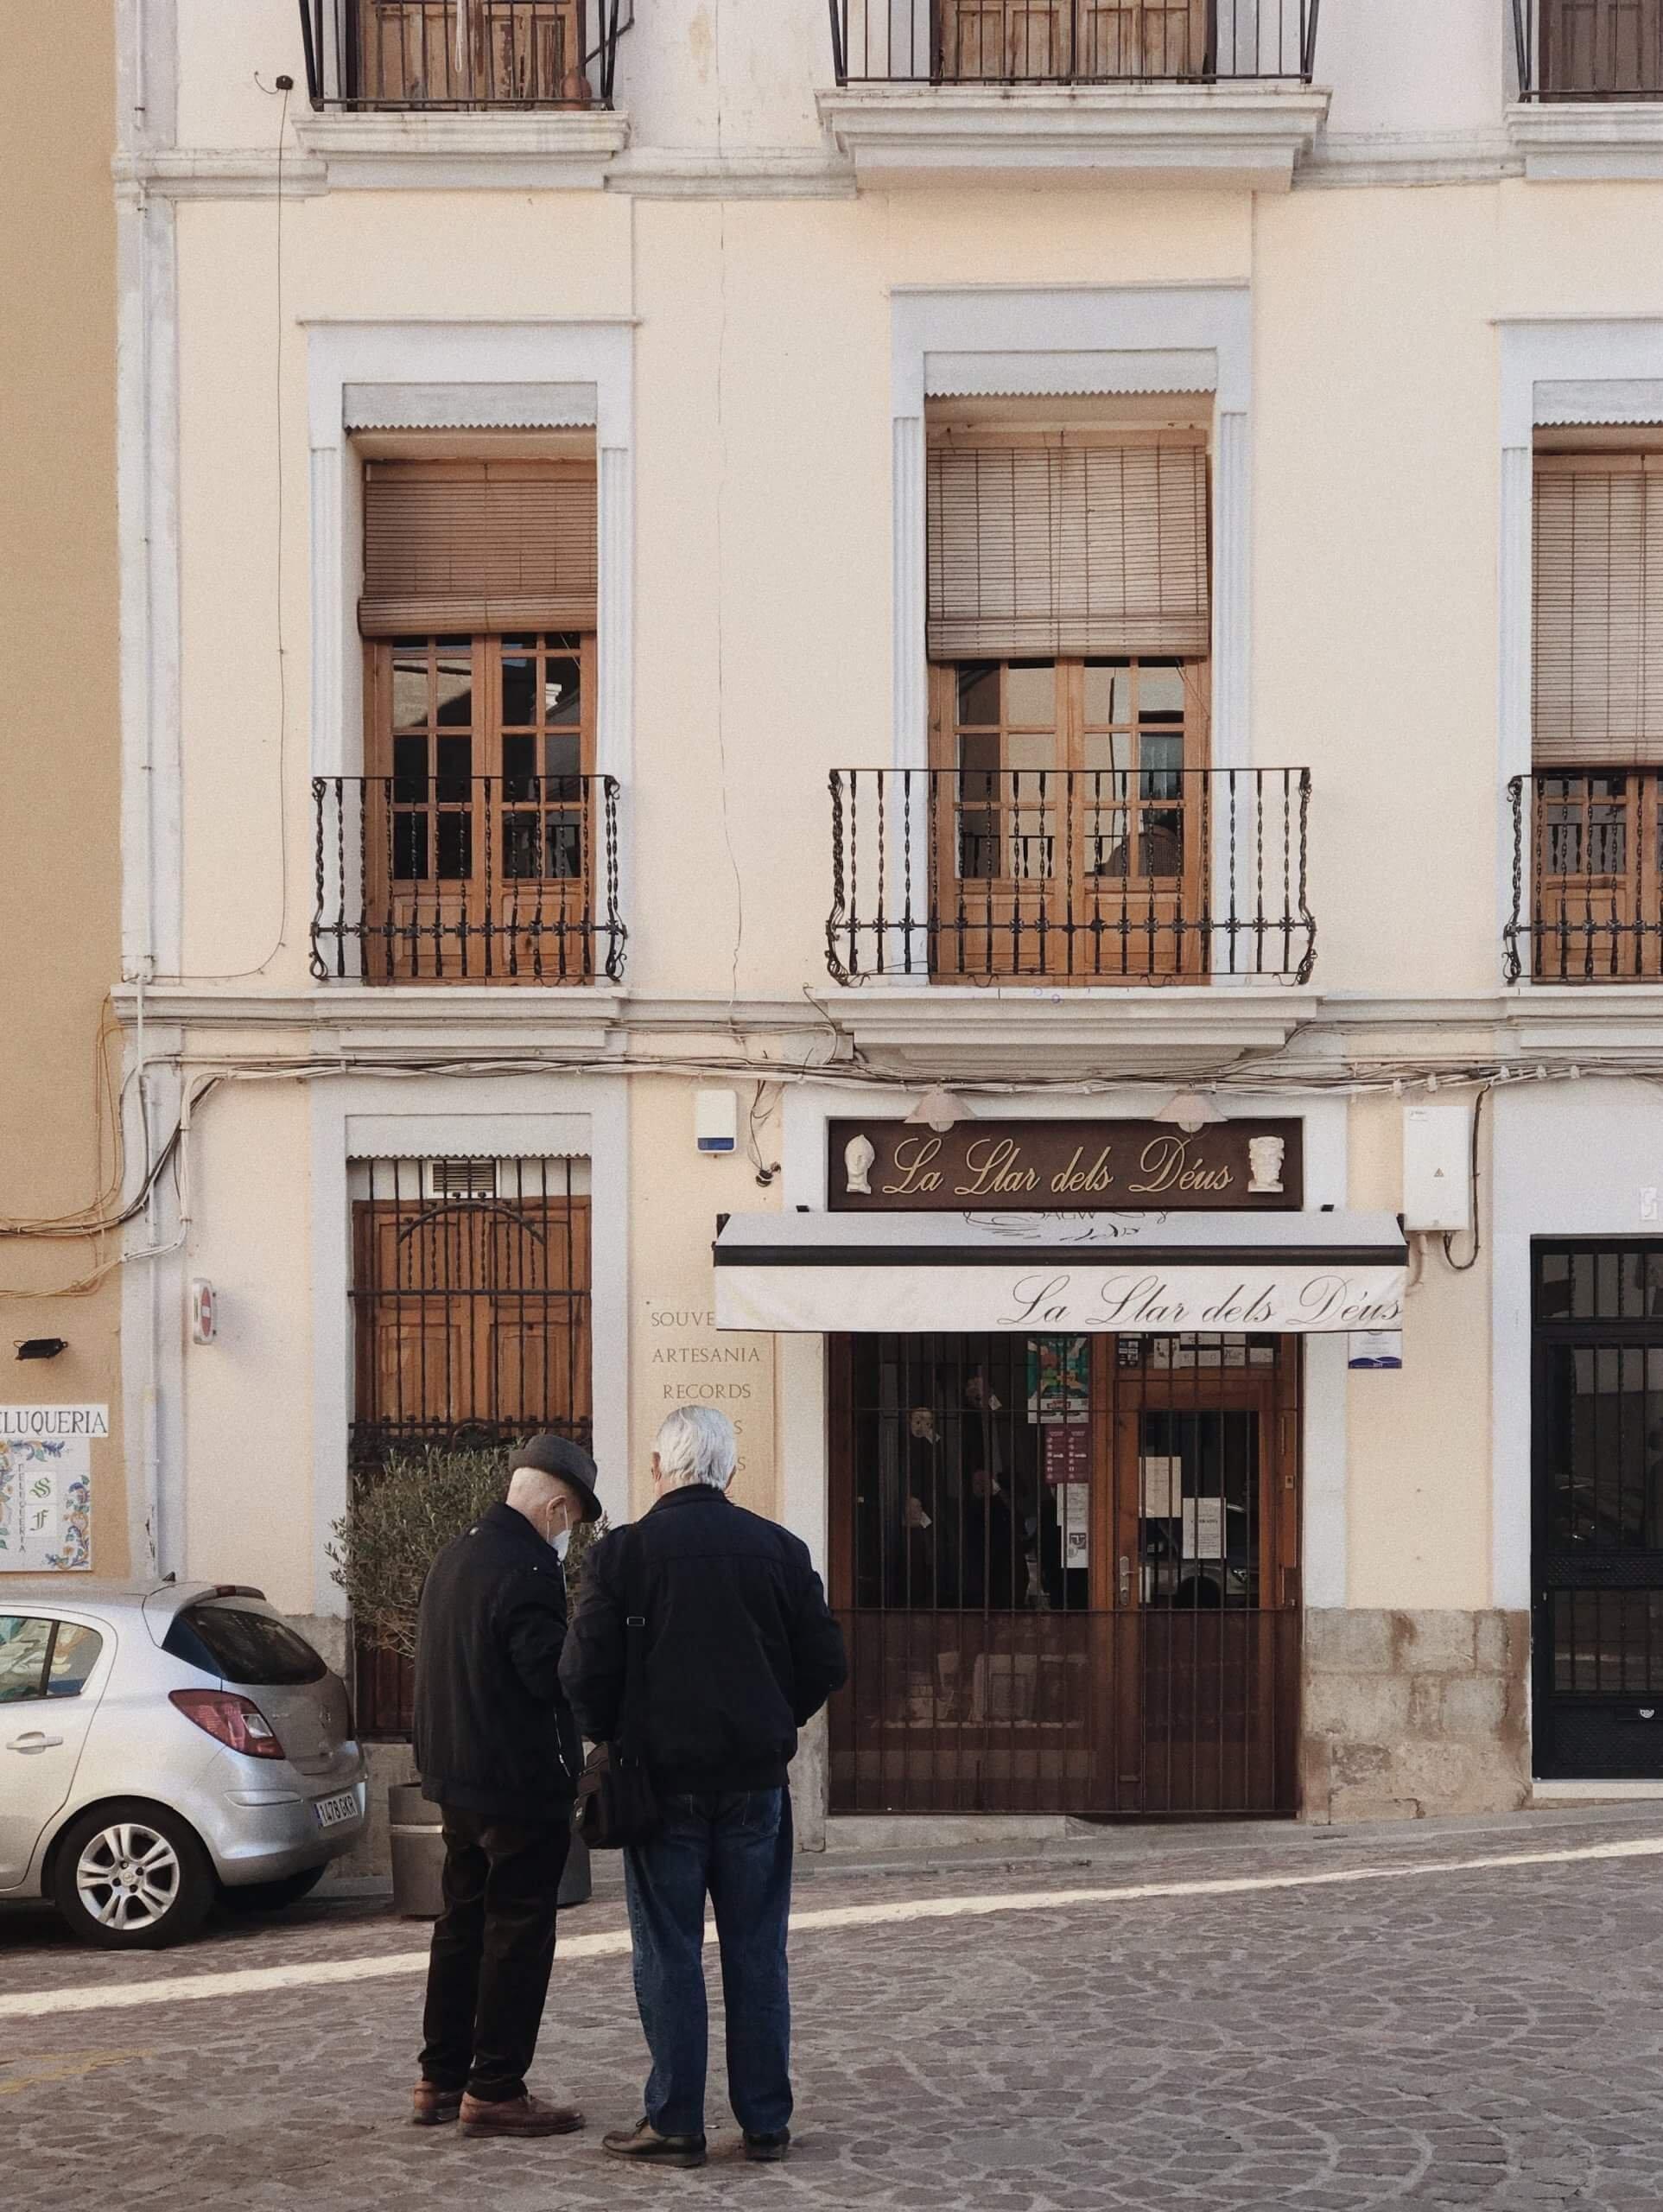 misvattingen over Spanje